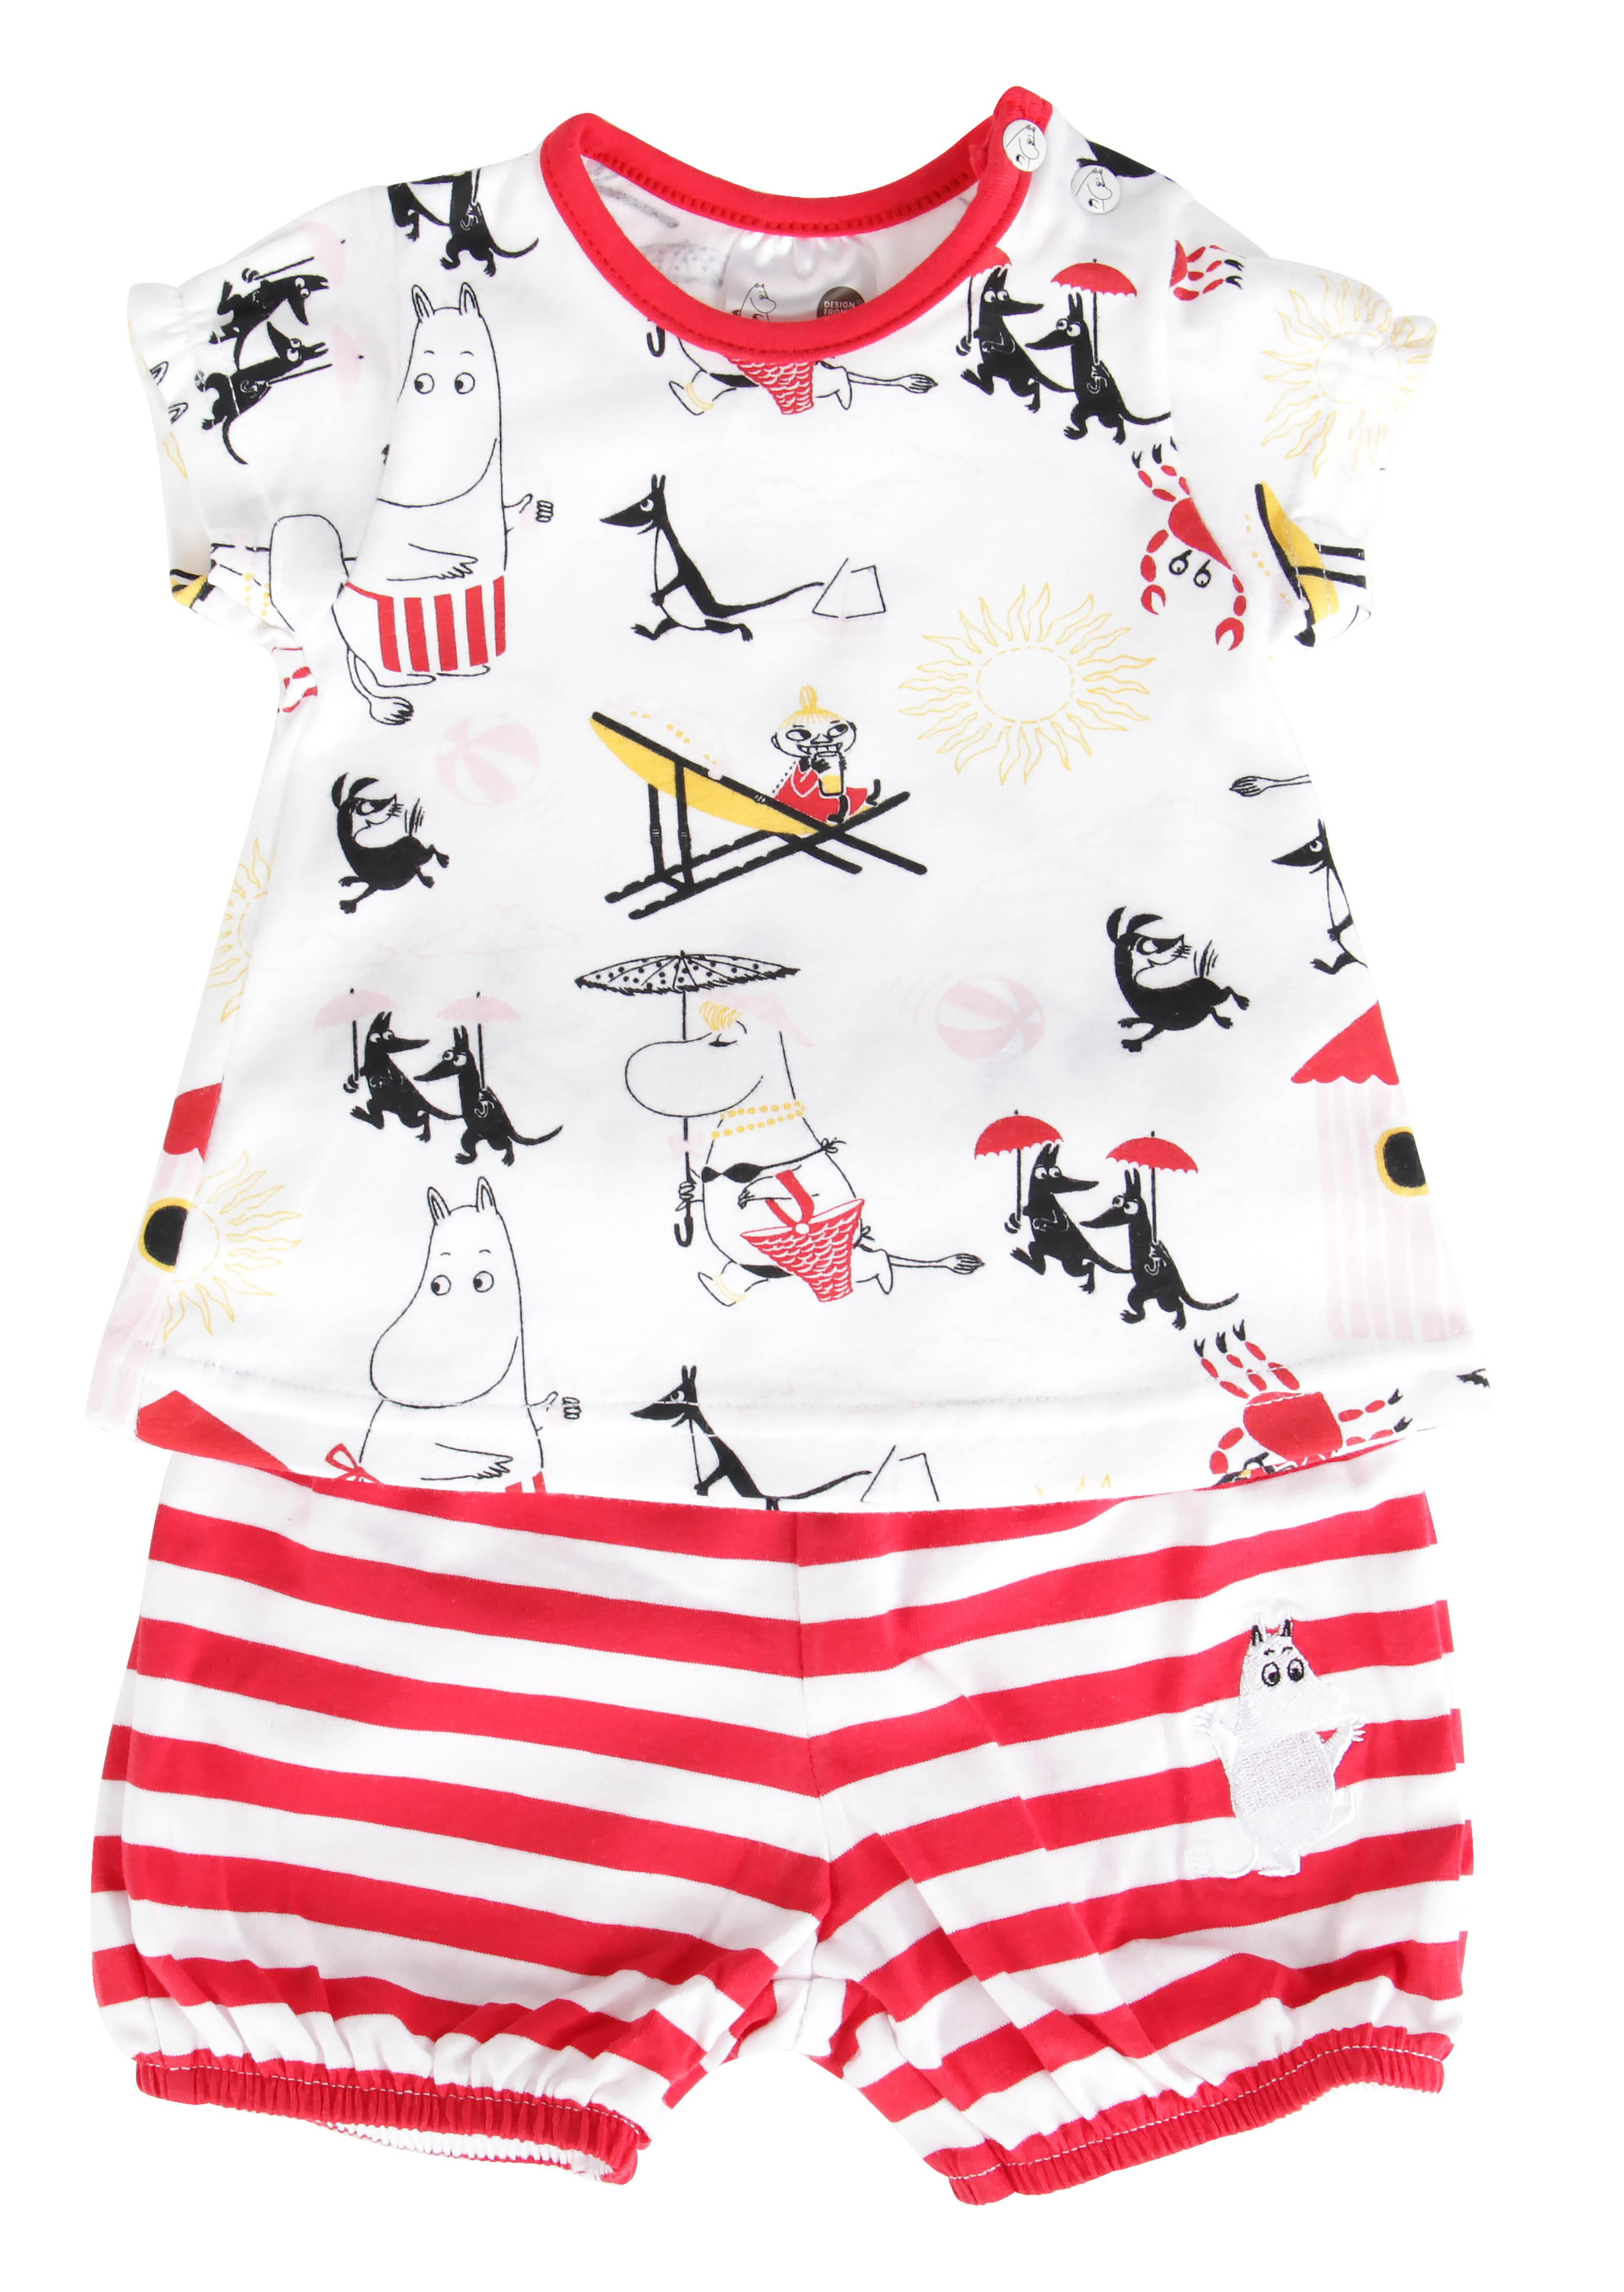 Martinex Moomin BEACH SHORTS SET WHT/RED